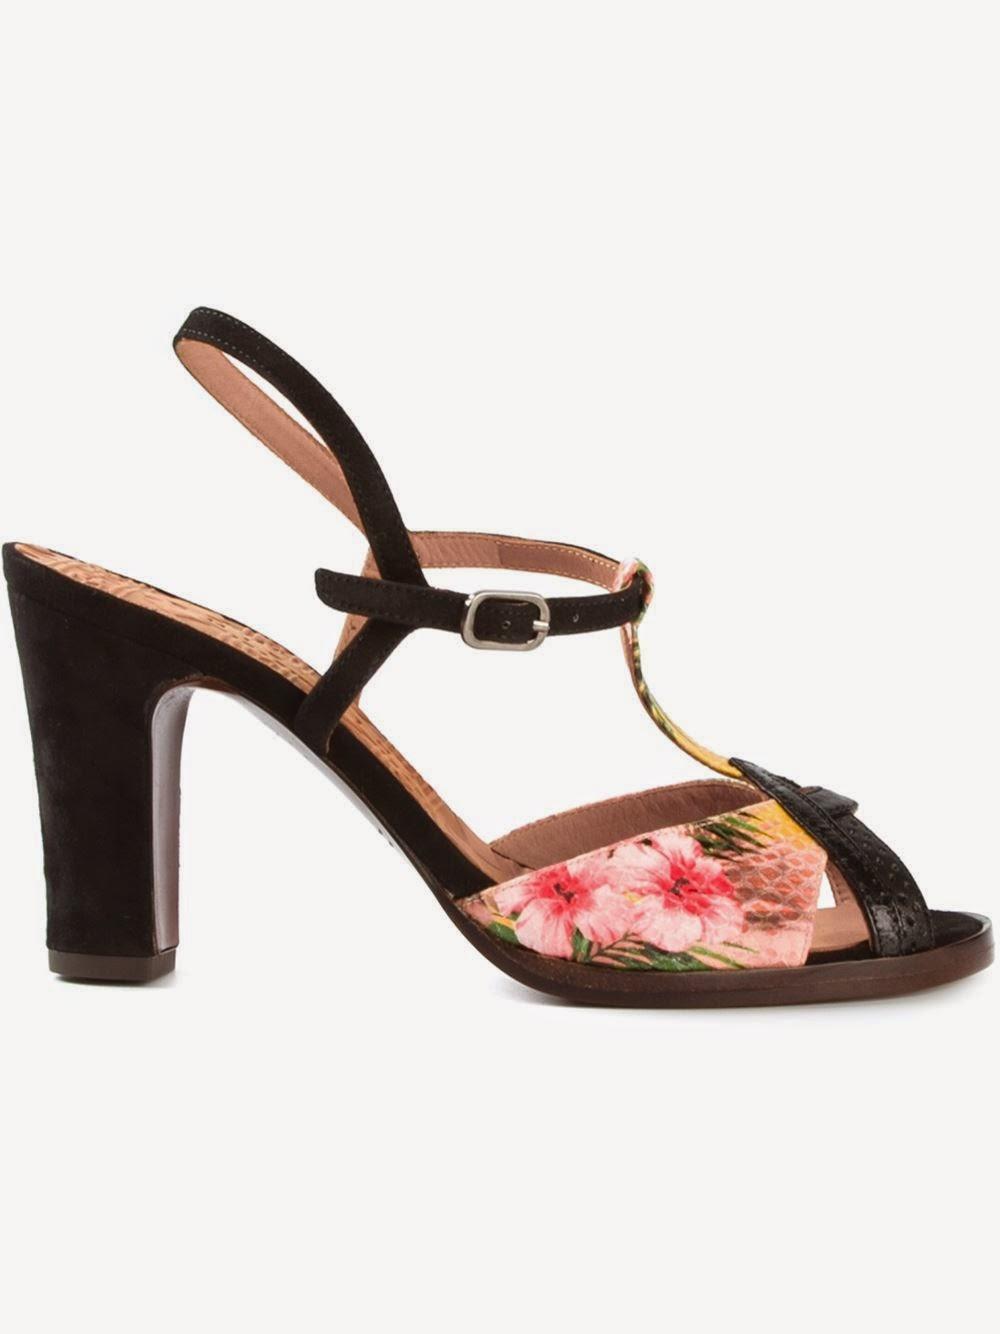 ChieMihara-printfloral-elblogdepatricia-shoes-calzado-calzature-scarpe